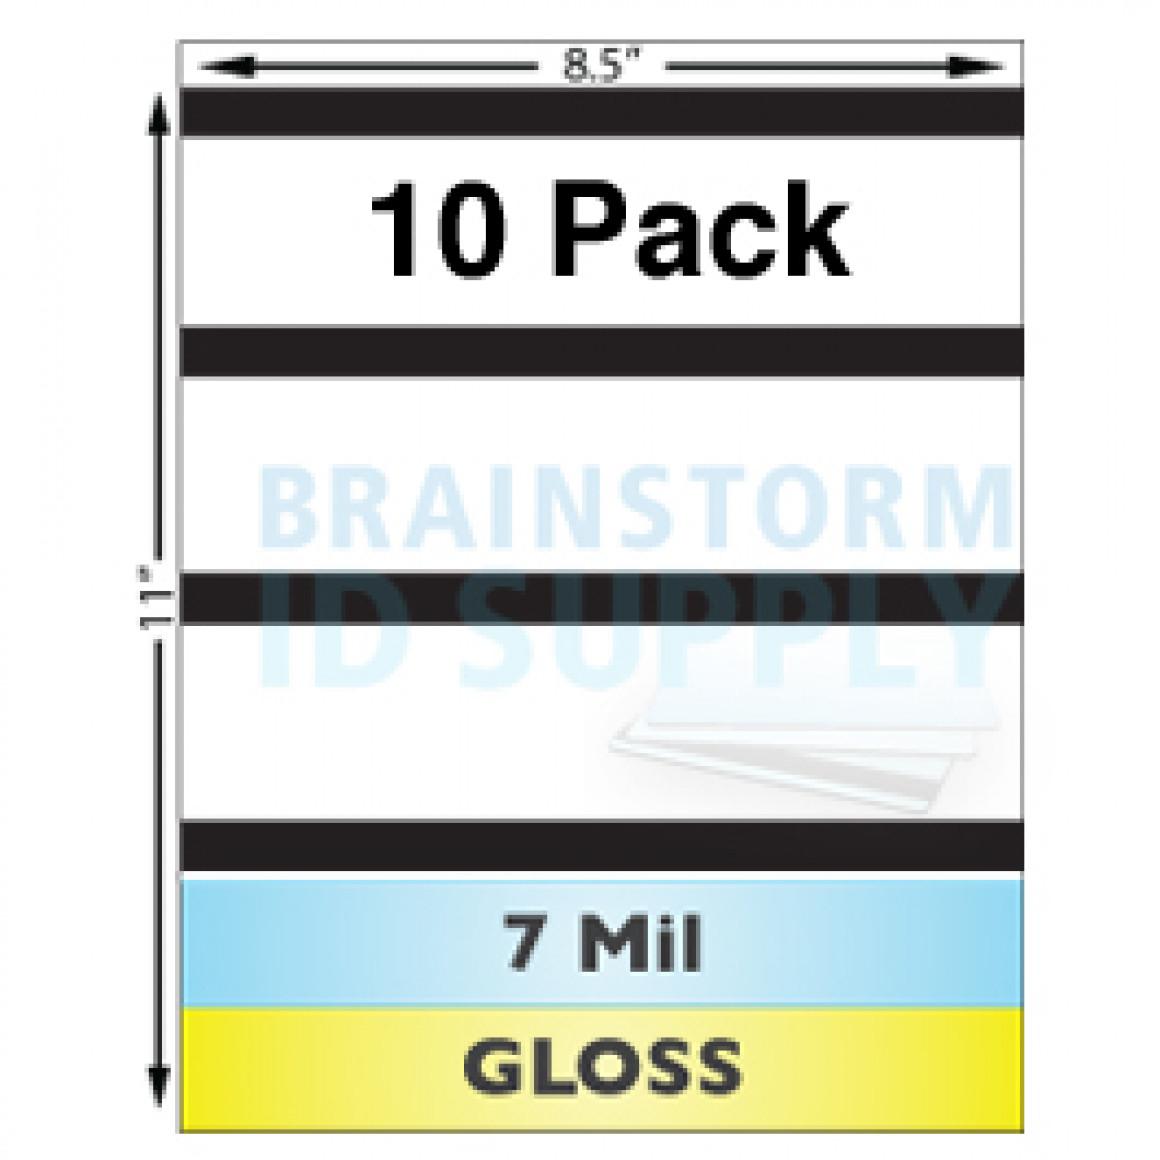 7 Mil Gloss Full Sheet Laminates with 1/2